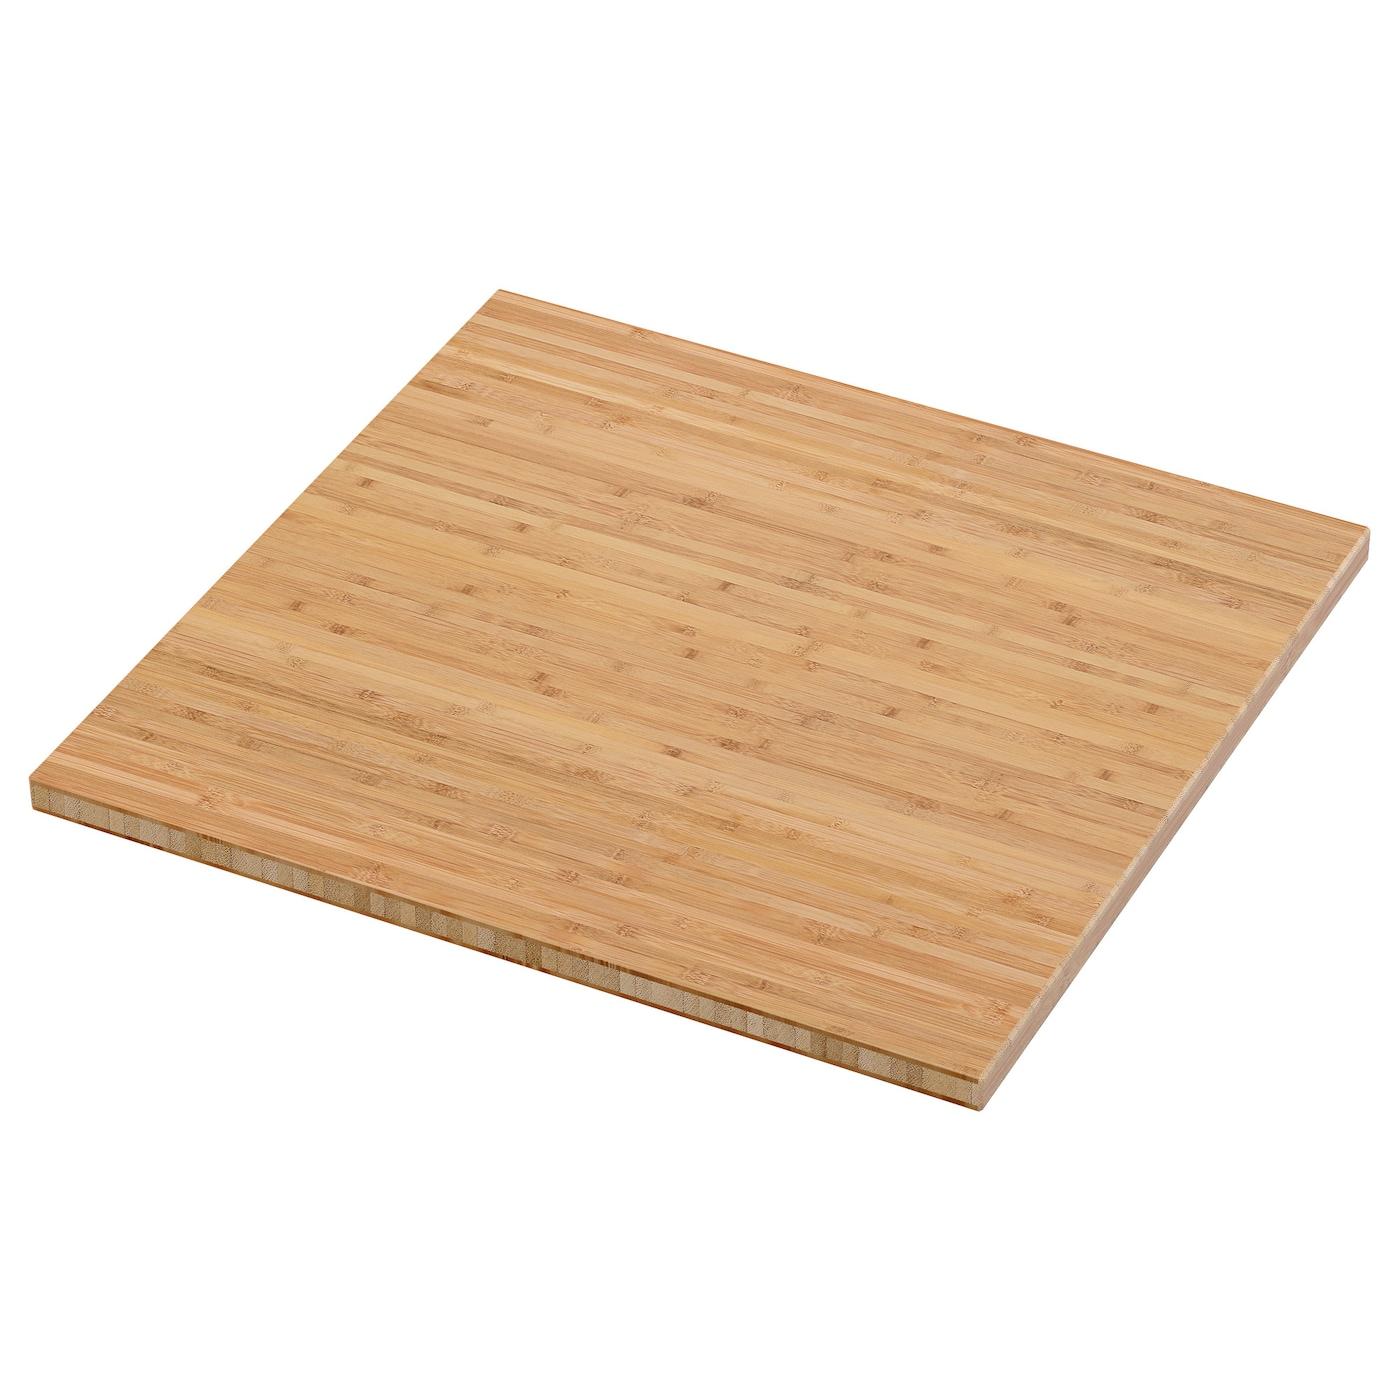 viskan plateau bambou 42 x 40 cm ikea. Black Bedroom Furniture Sets. Home Design Ideas